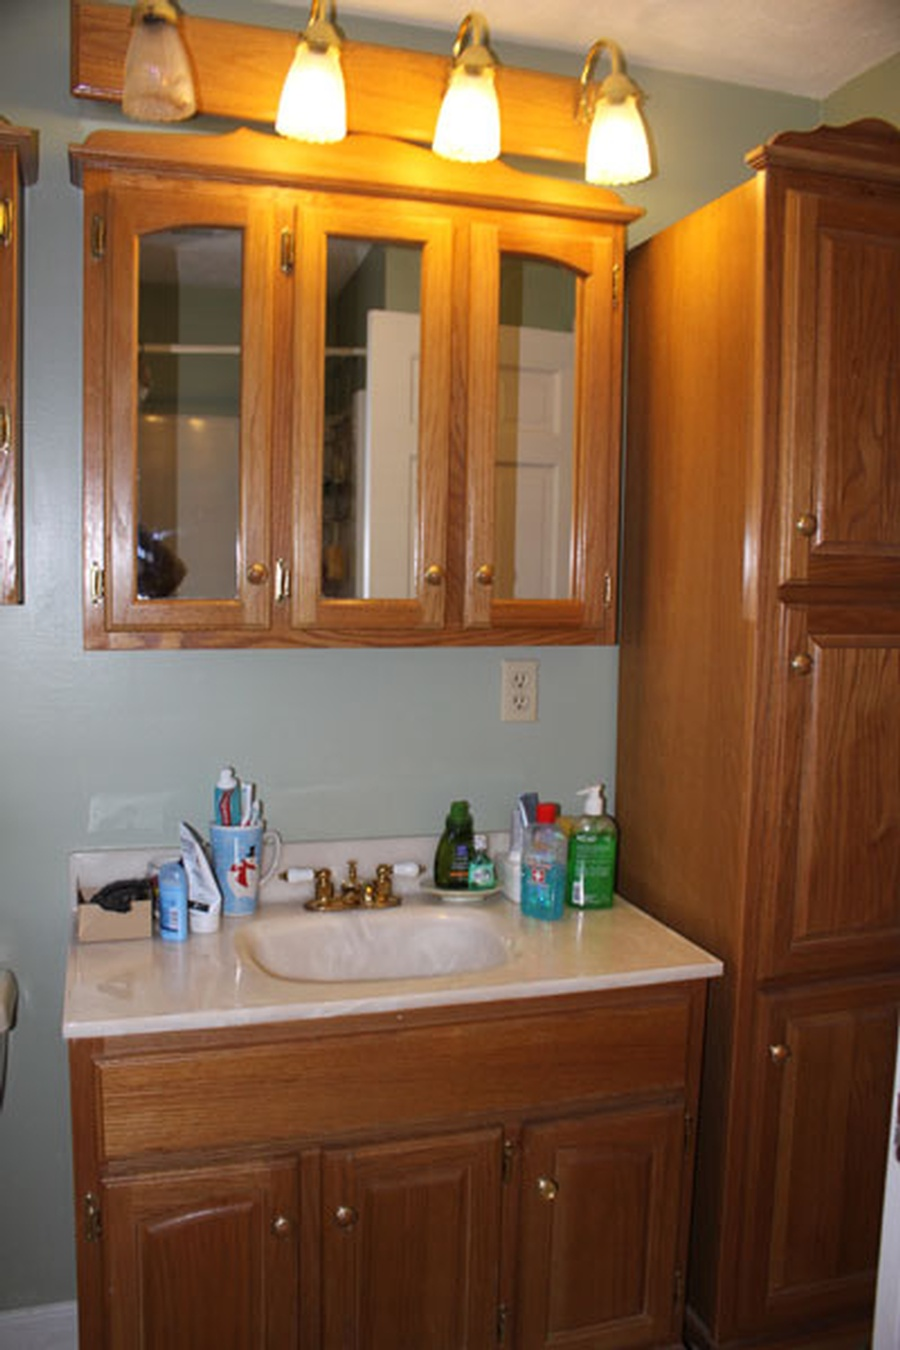 Bathroom Remodeling Designing In Merrimack Dover Hampton - Bathroom remodel nashua nh